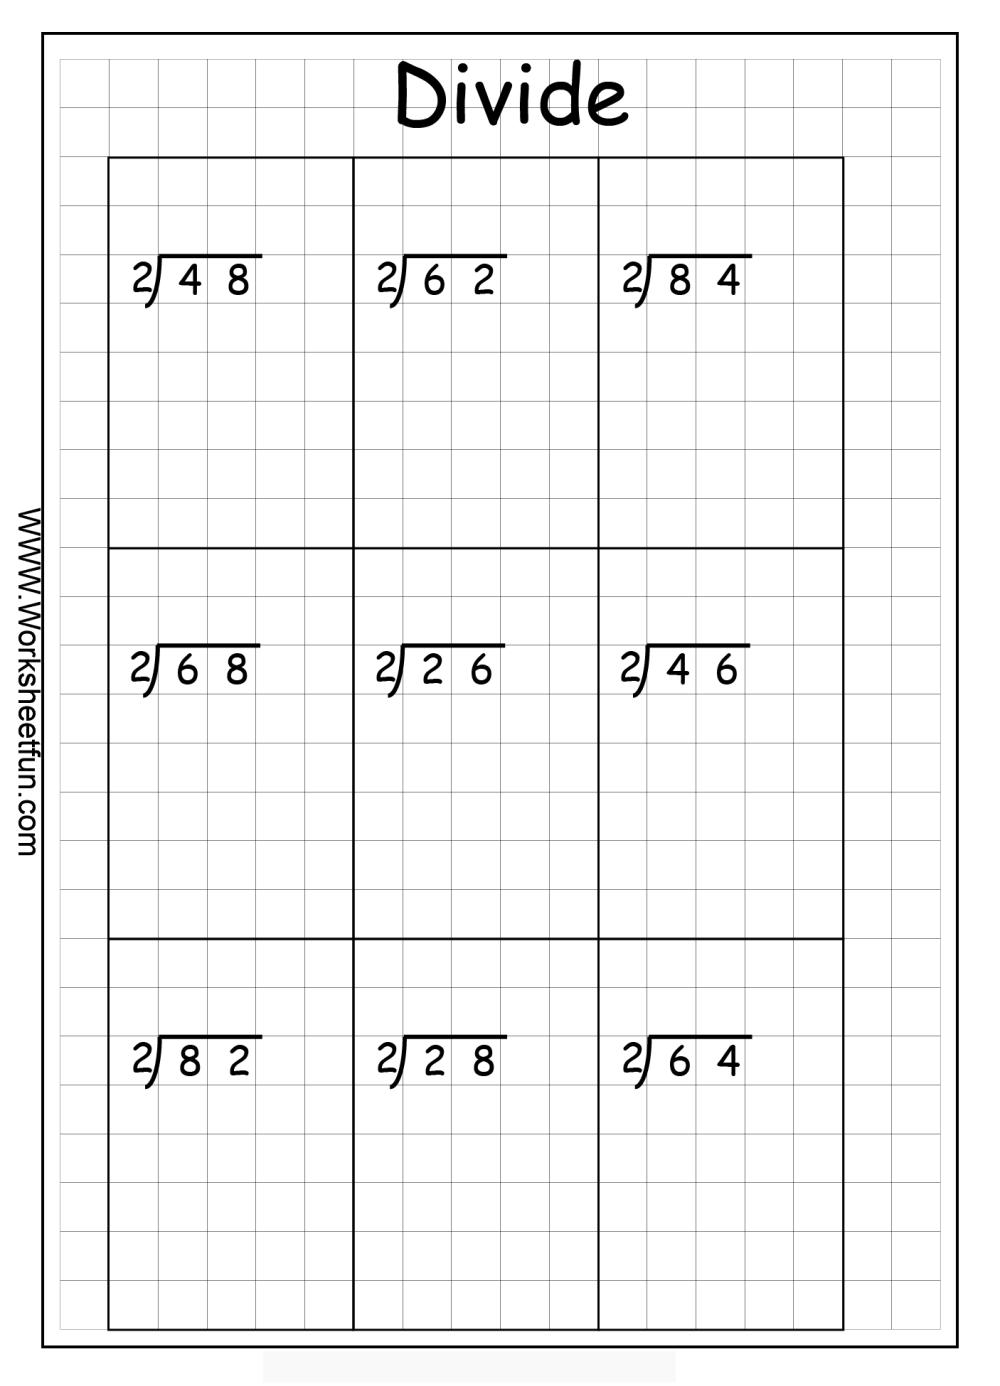 medium resolution of Long division homework help - Division worksheets for grades 3